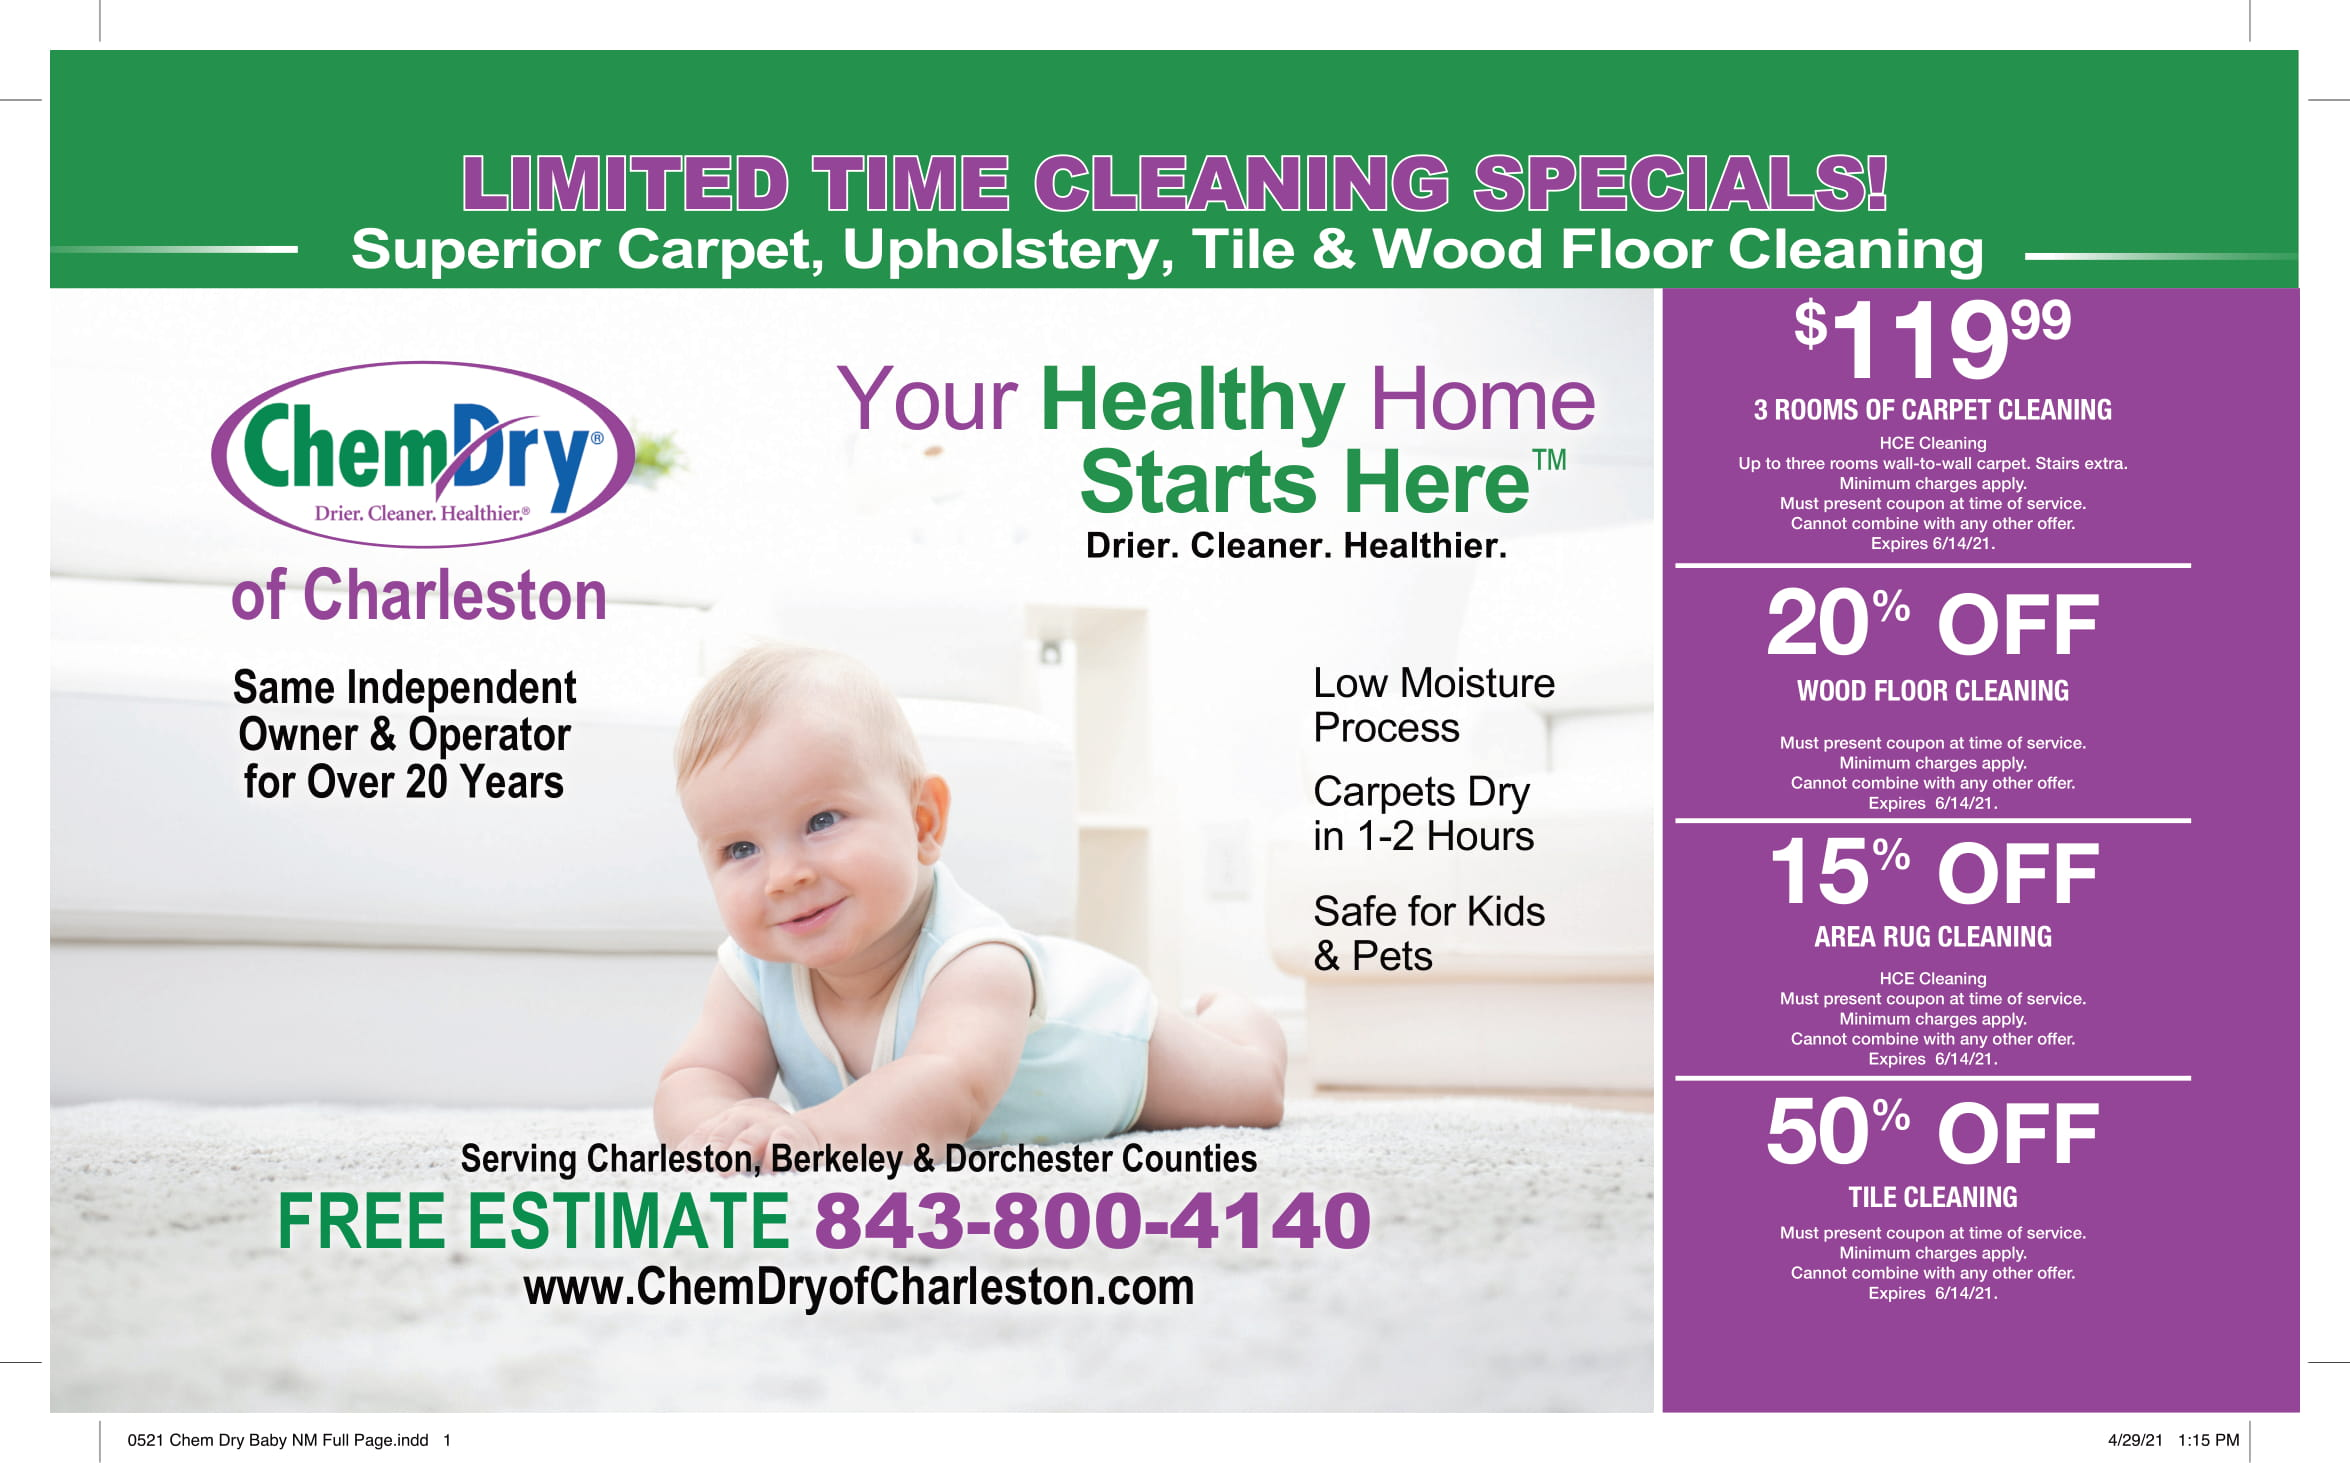 0521 Chem Dry Baby NM Full Page 1